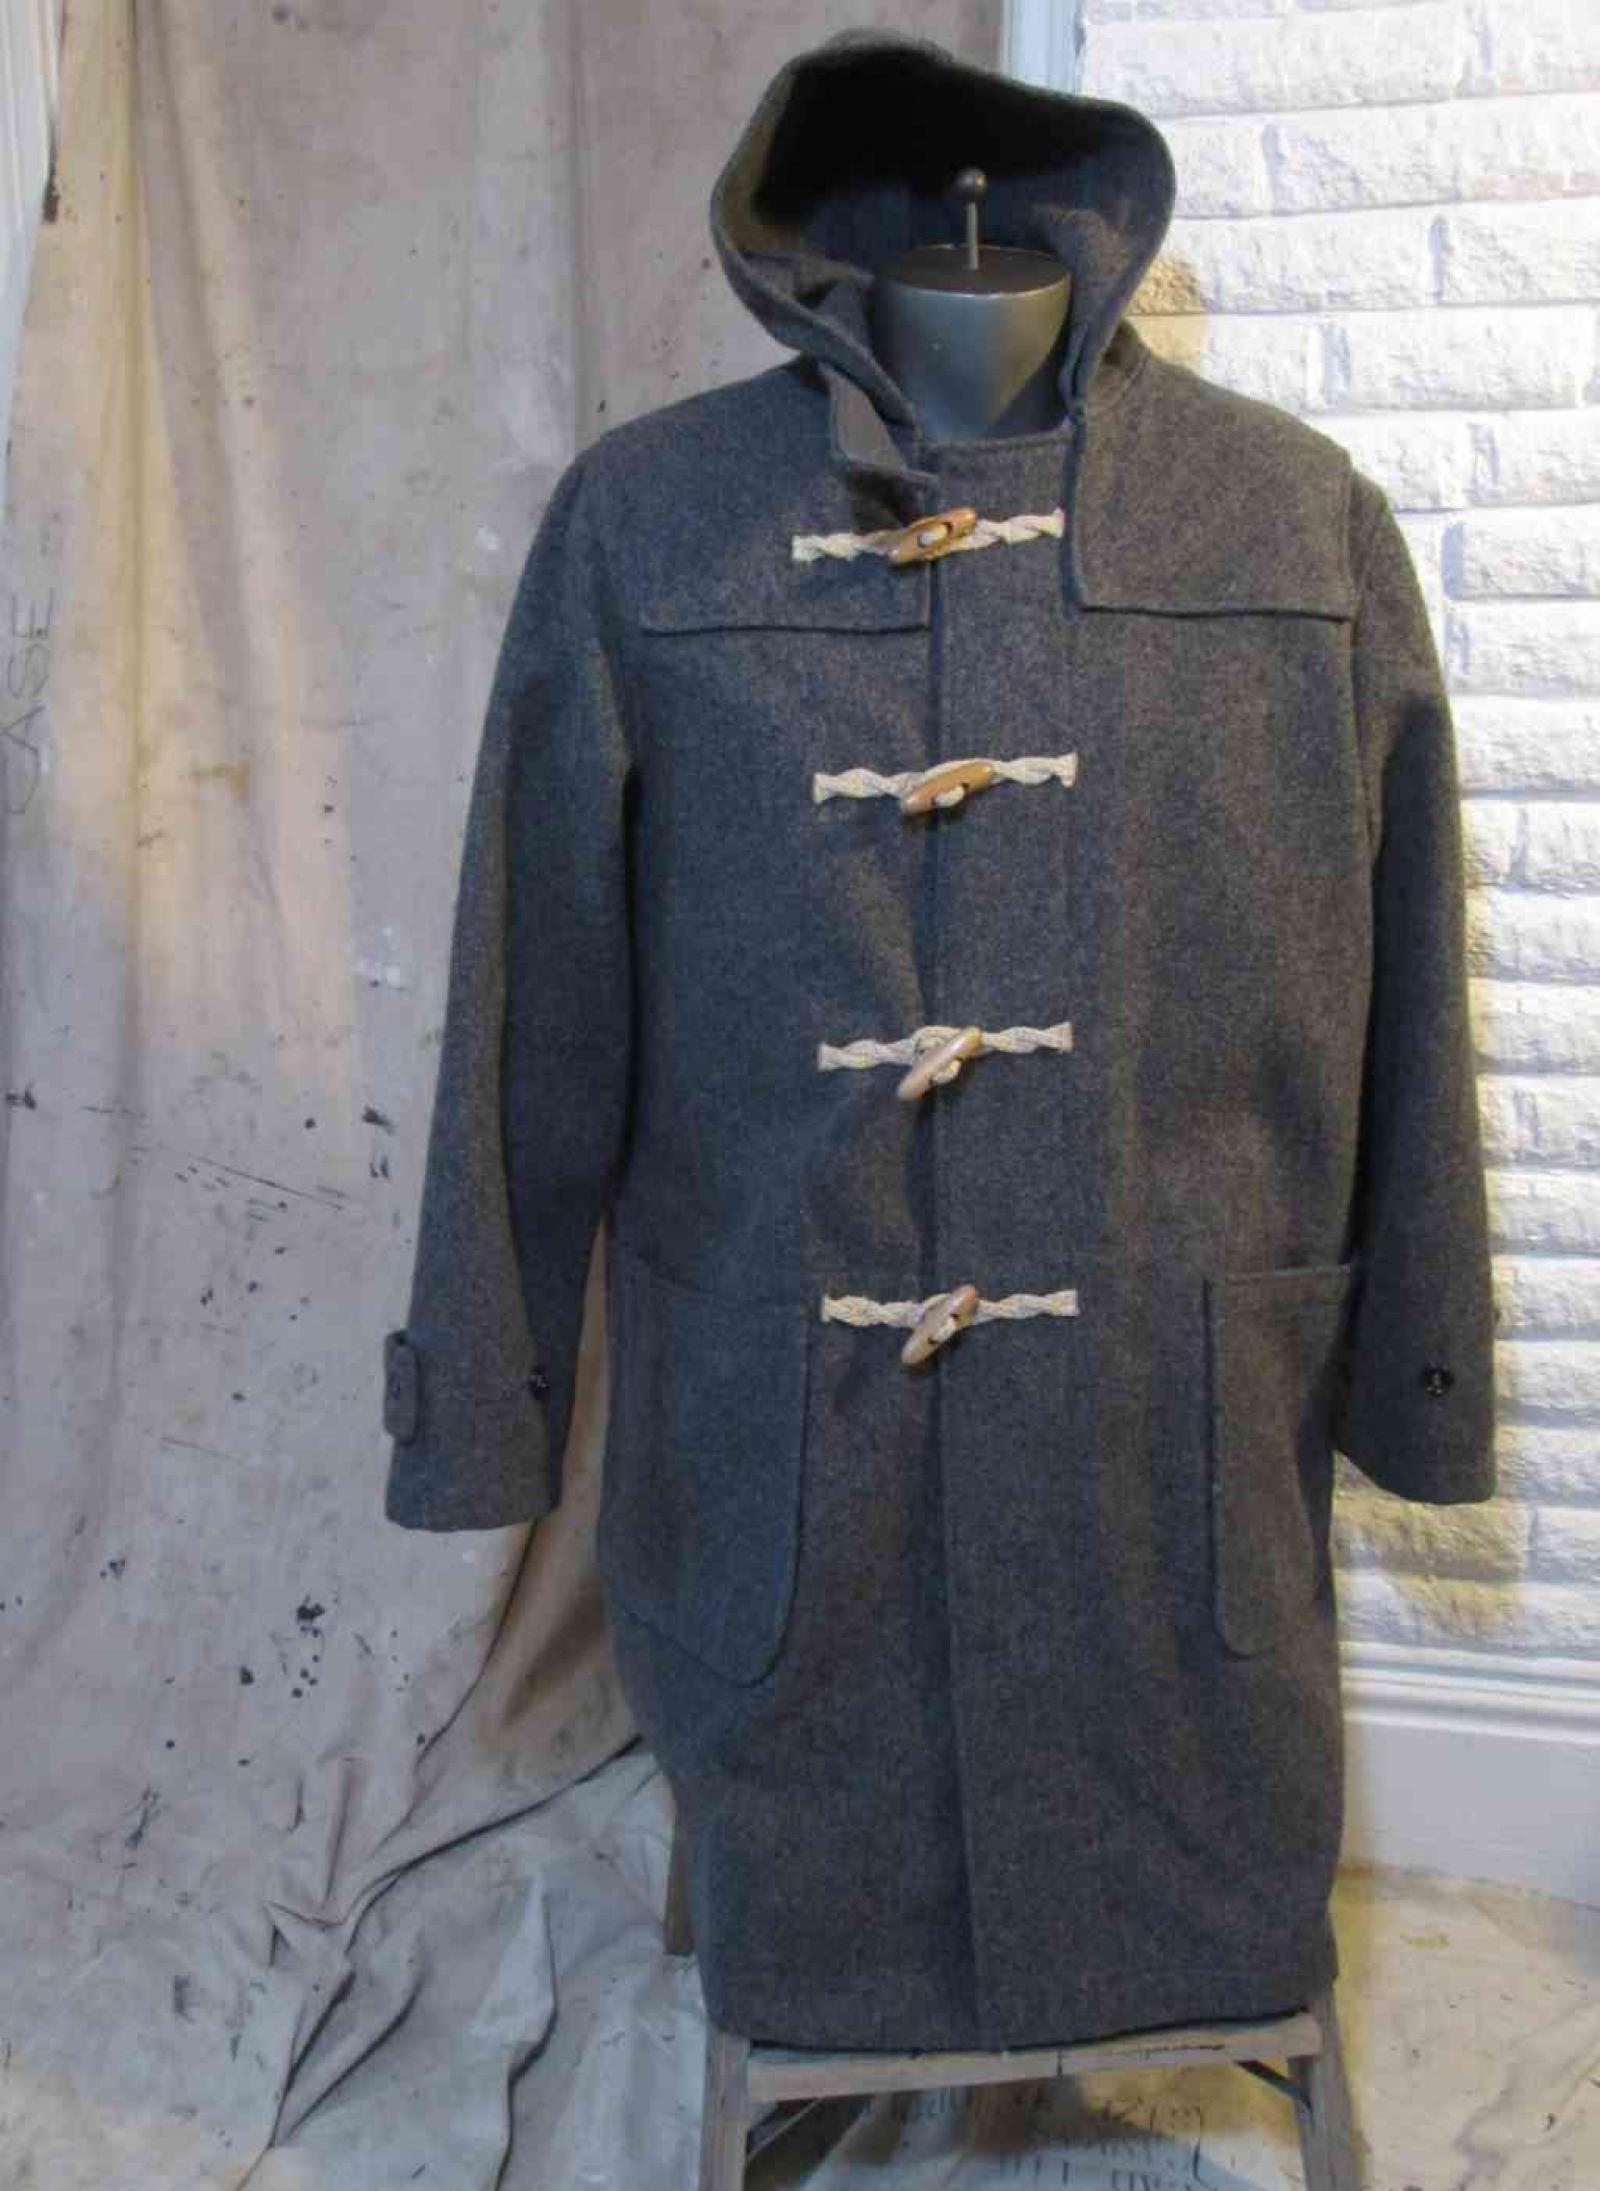 Schott Duffle Coat Melton wool Gray coat Hemp and Wood toggles and ...